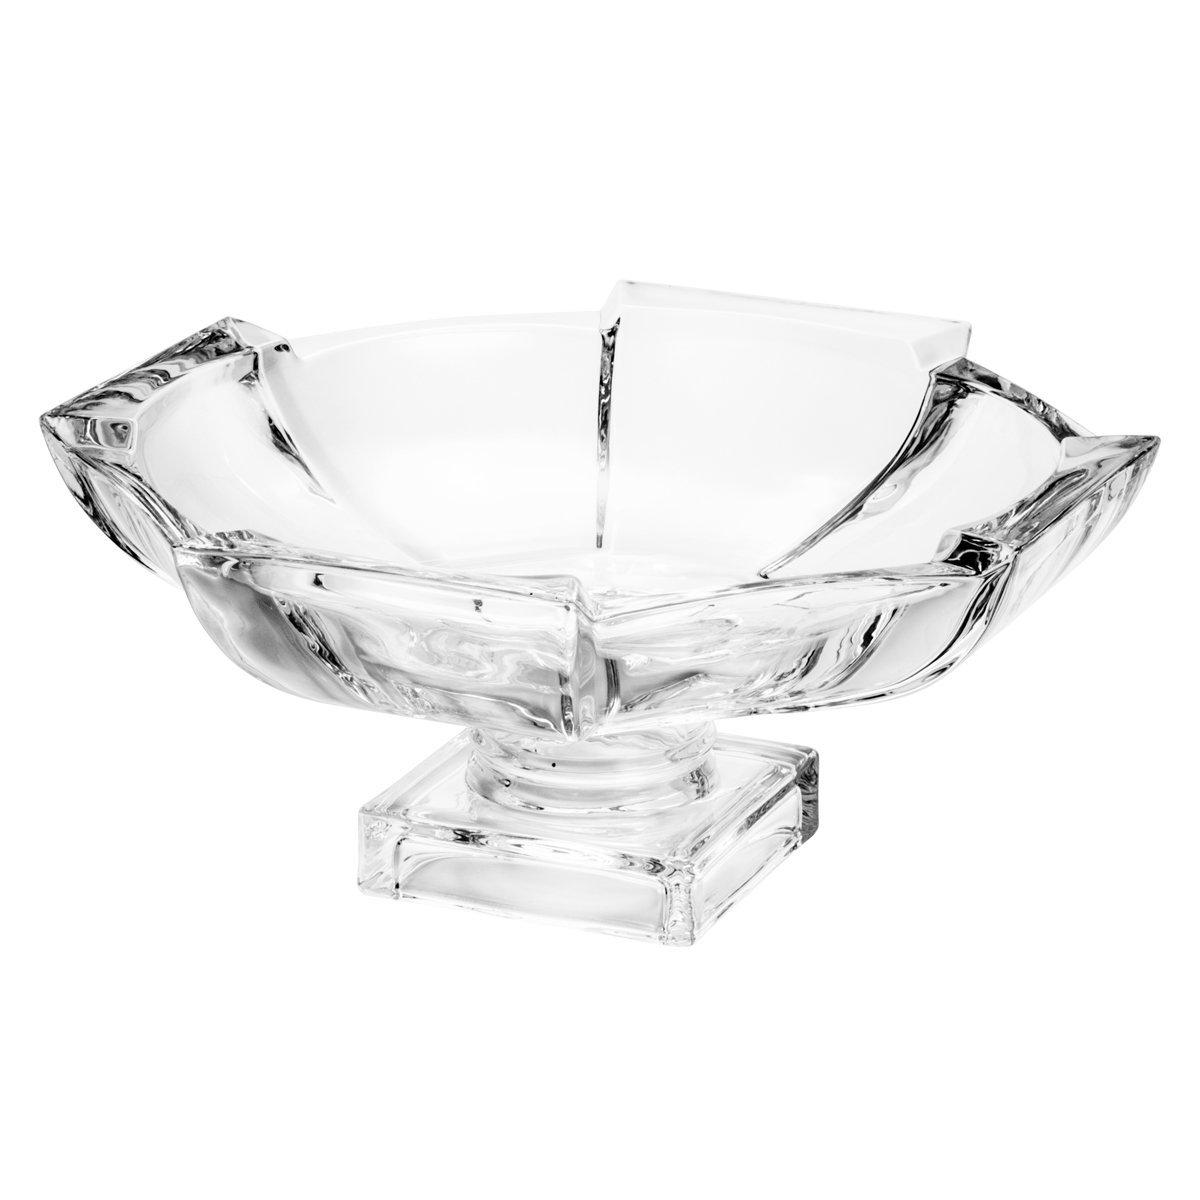 Fruteira 32 cm de cristal transparente com pé Stage Wolff - 25537